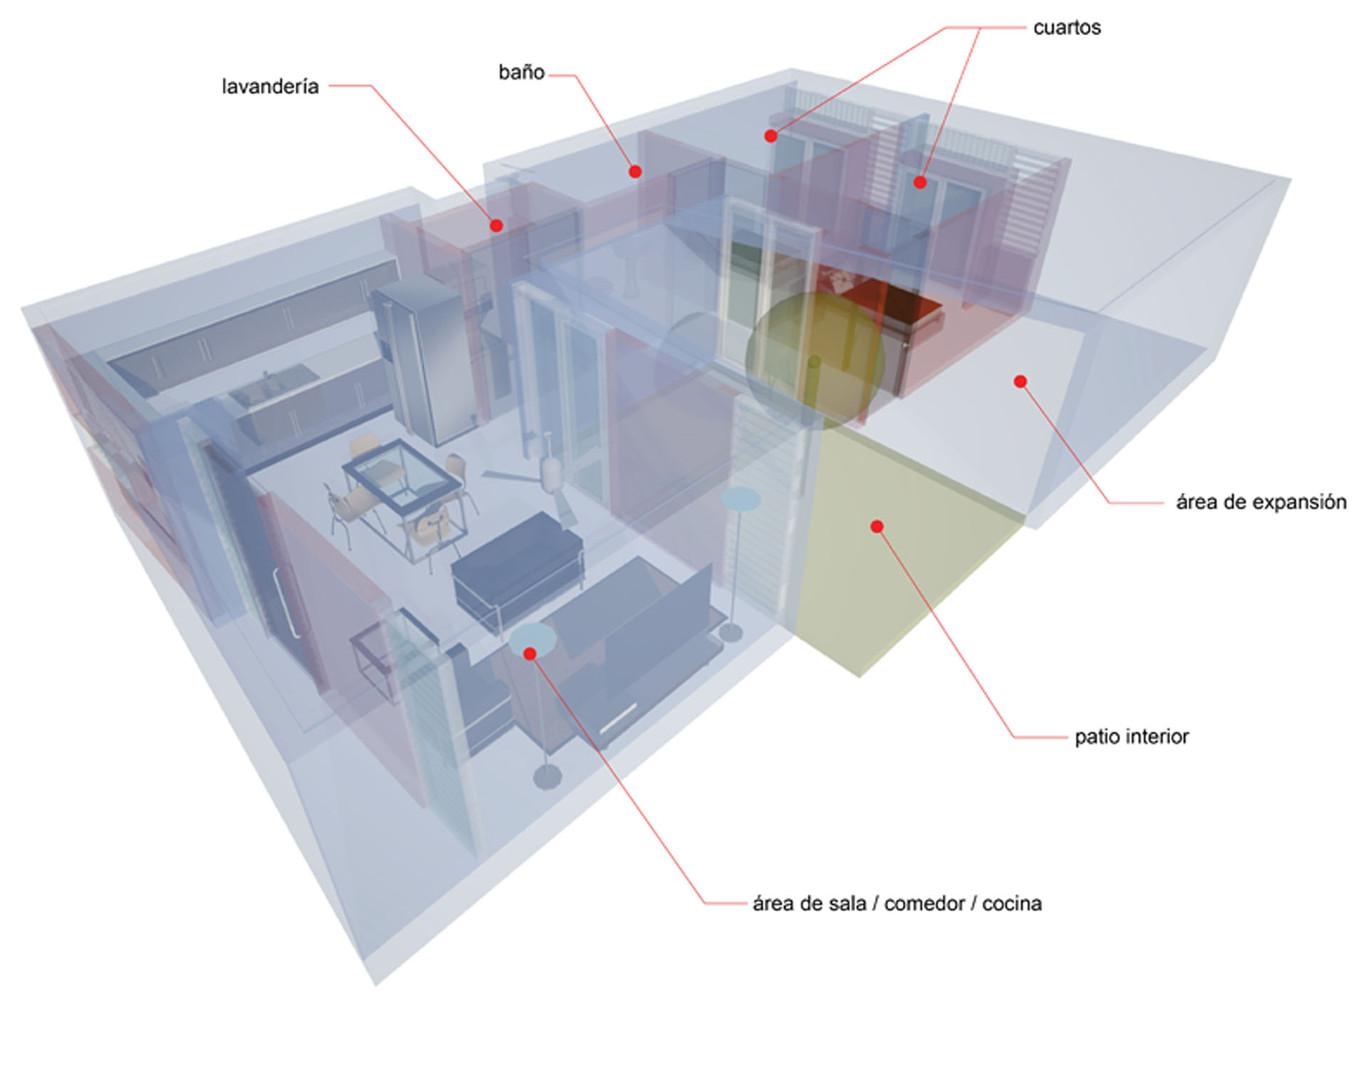 Composition of Spaces Diagram